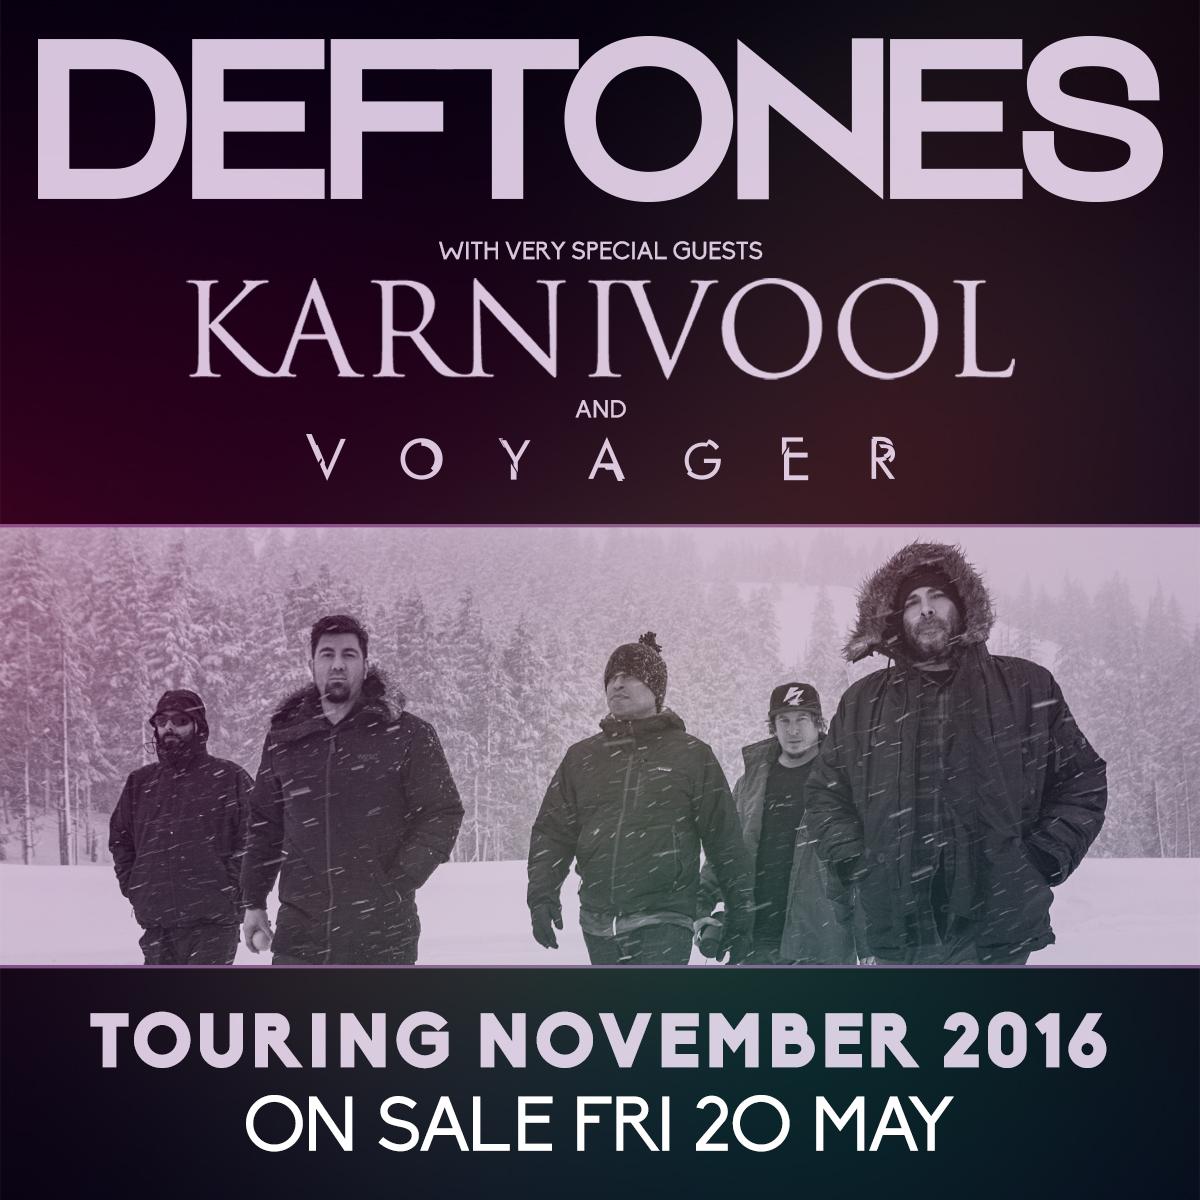 Deftones, Karnivool, perfect.